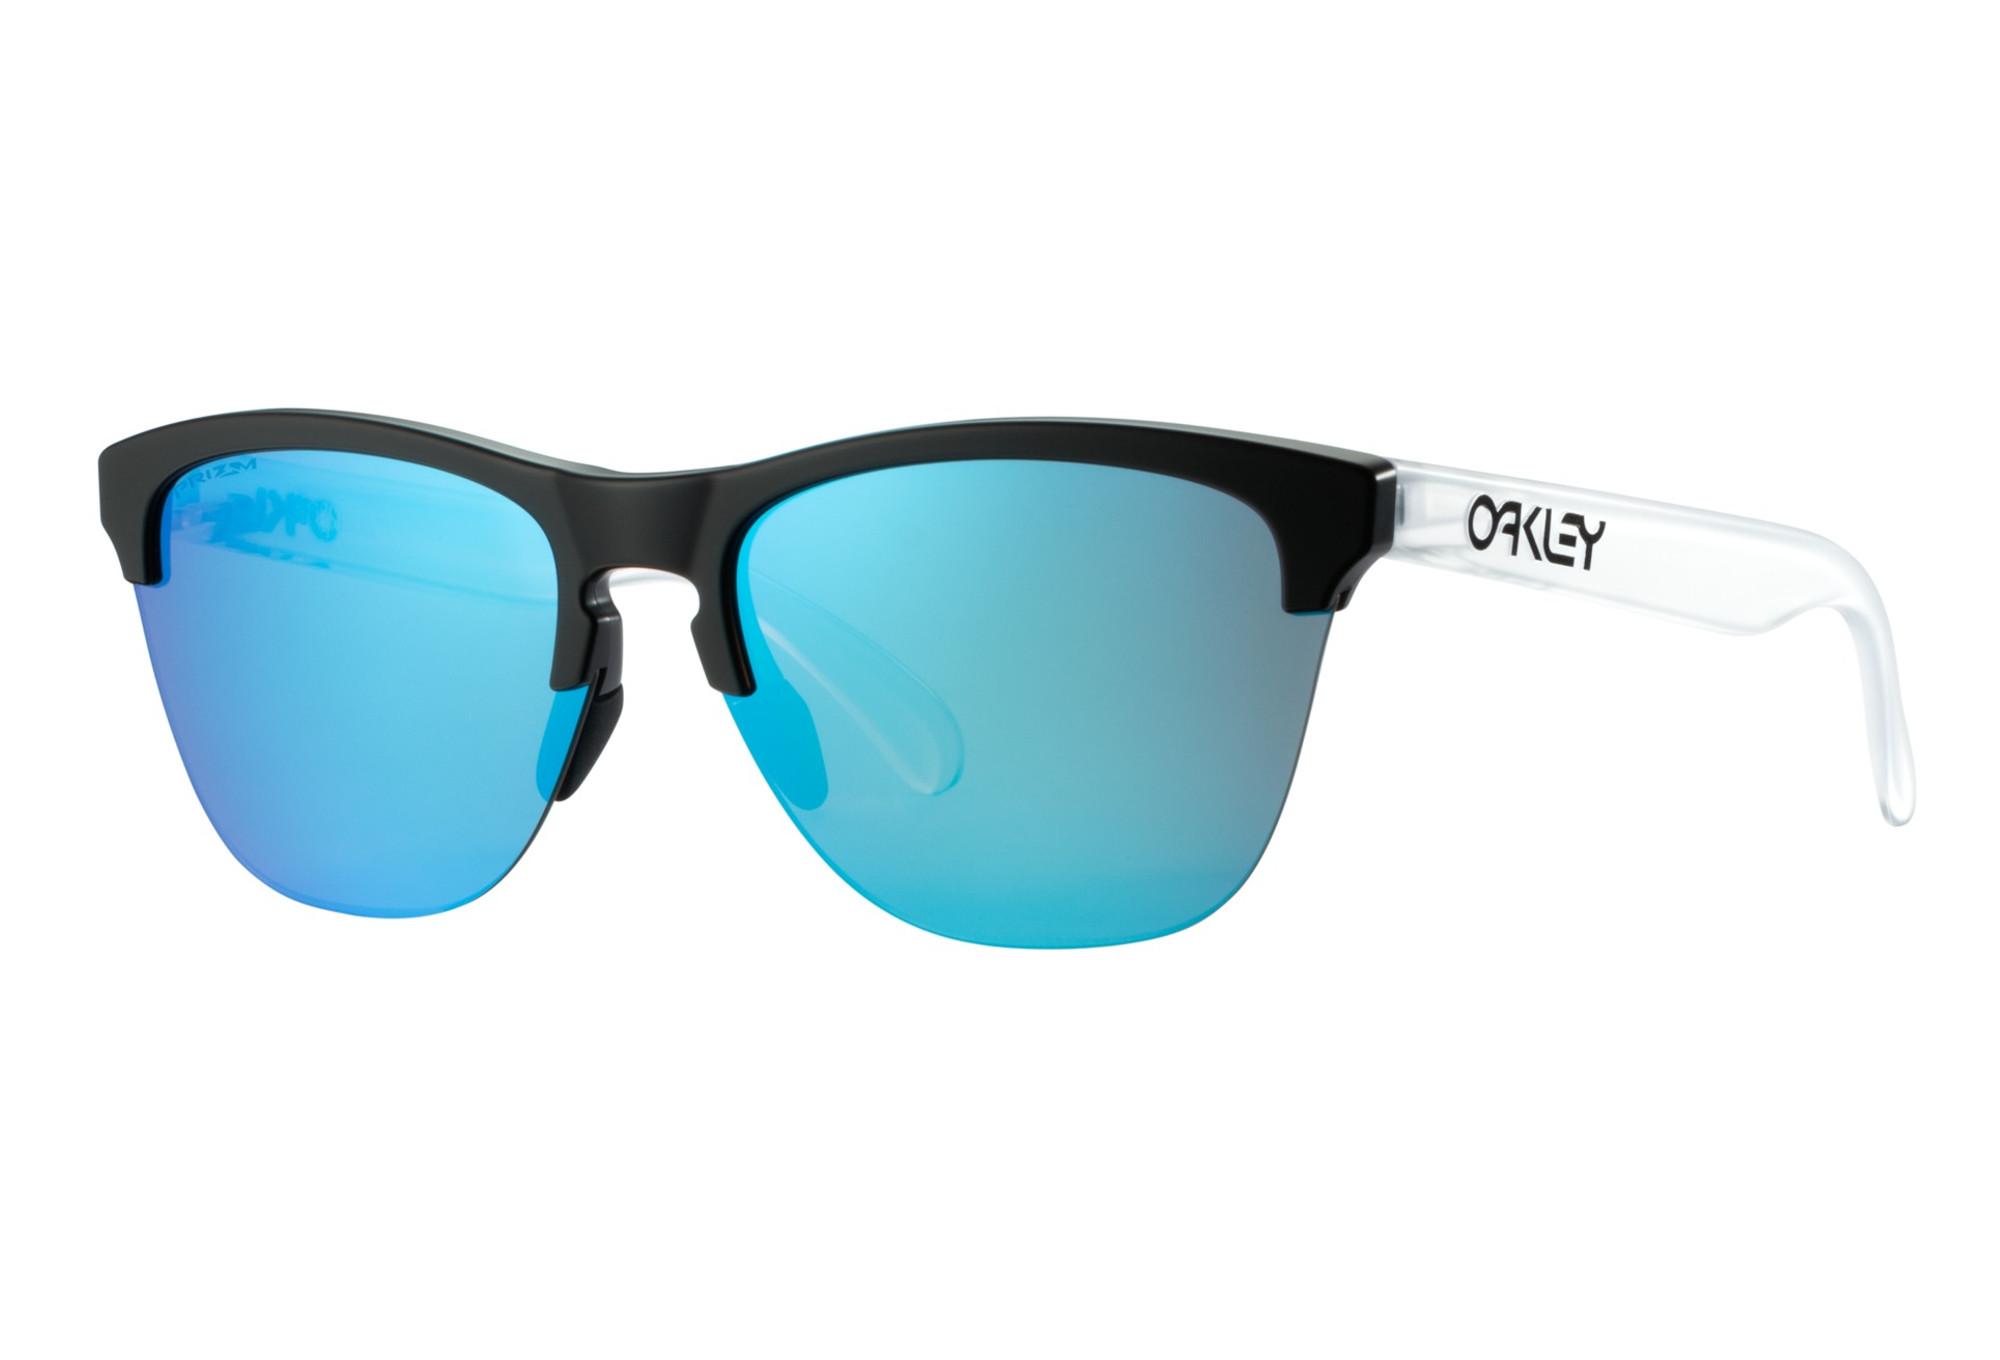 5b5ea23897 Gafas de sol OAKLEY Frogskins Lite Clear Black - PRIZM Sapphir ...